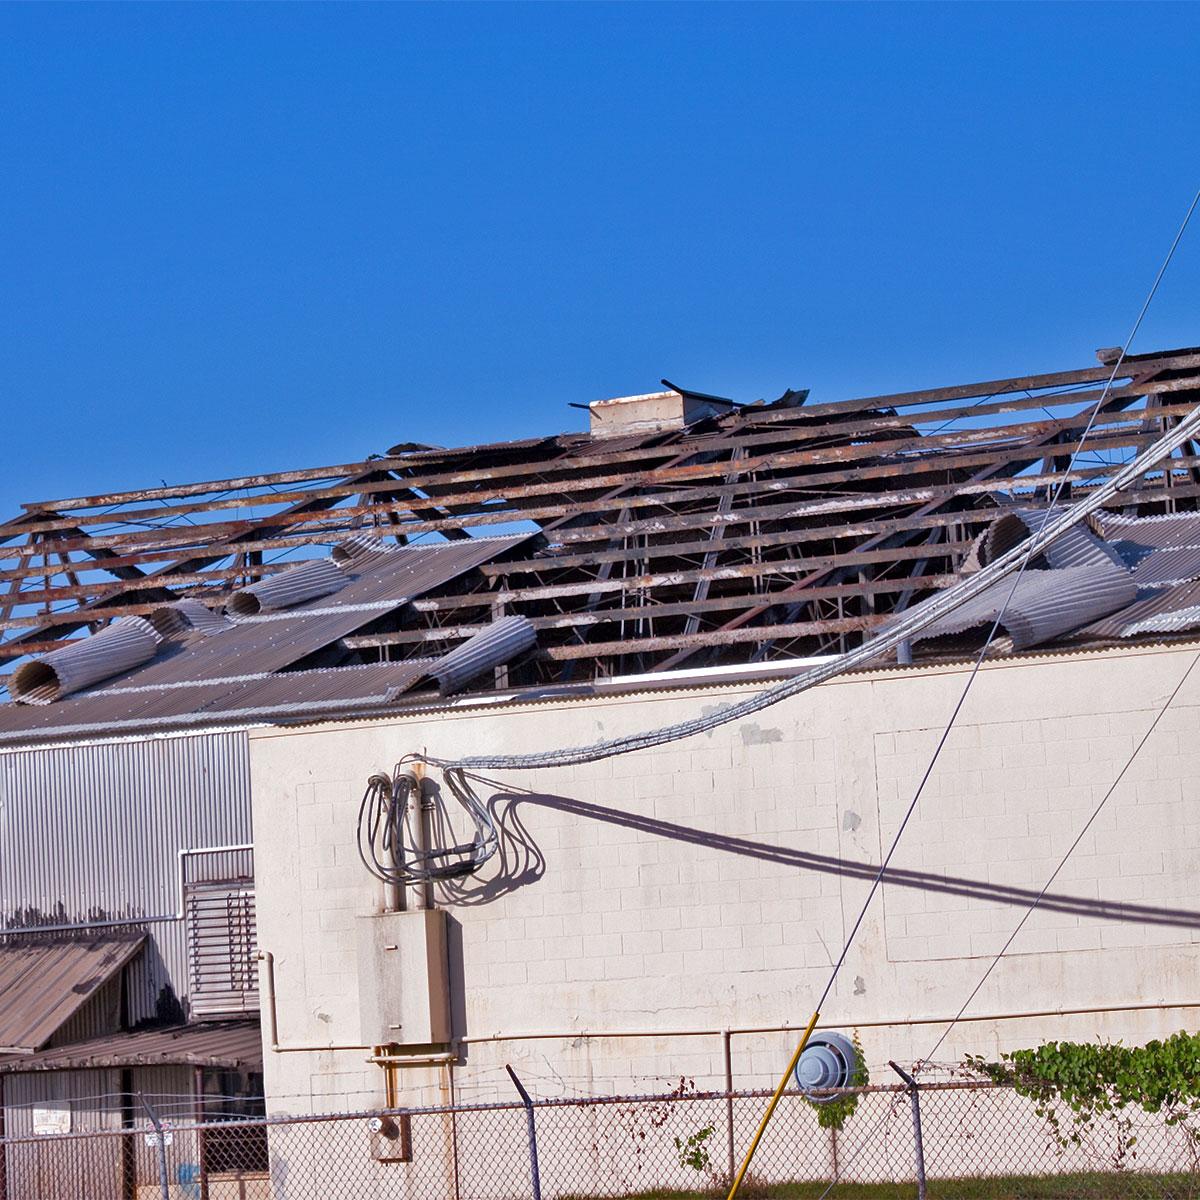 roof damage in southeastern Michigan